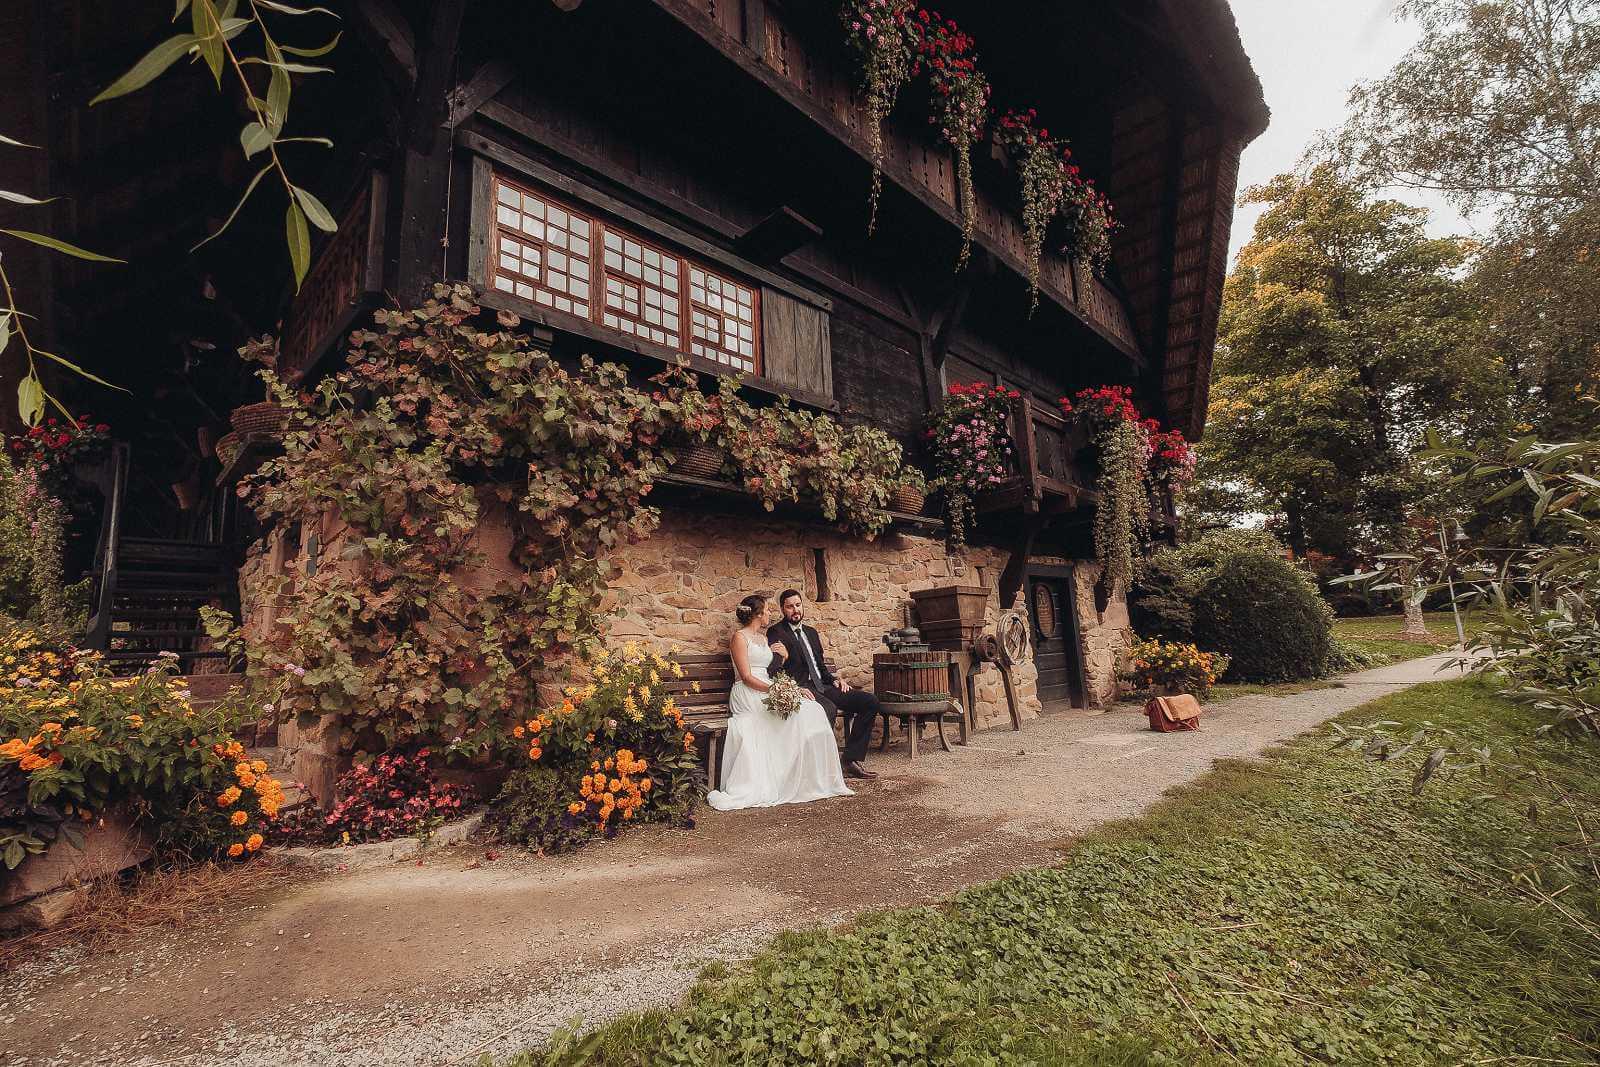 Hochzeitsfotograf Offenburg Zell am Harmersbach Bärenkeller (28)